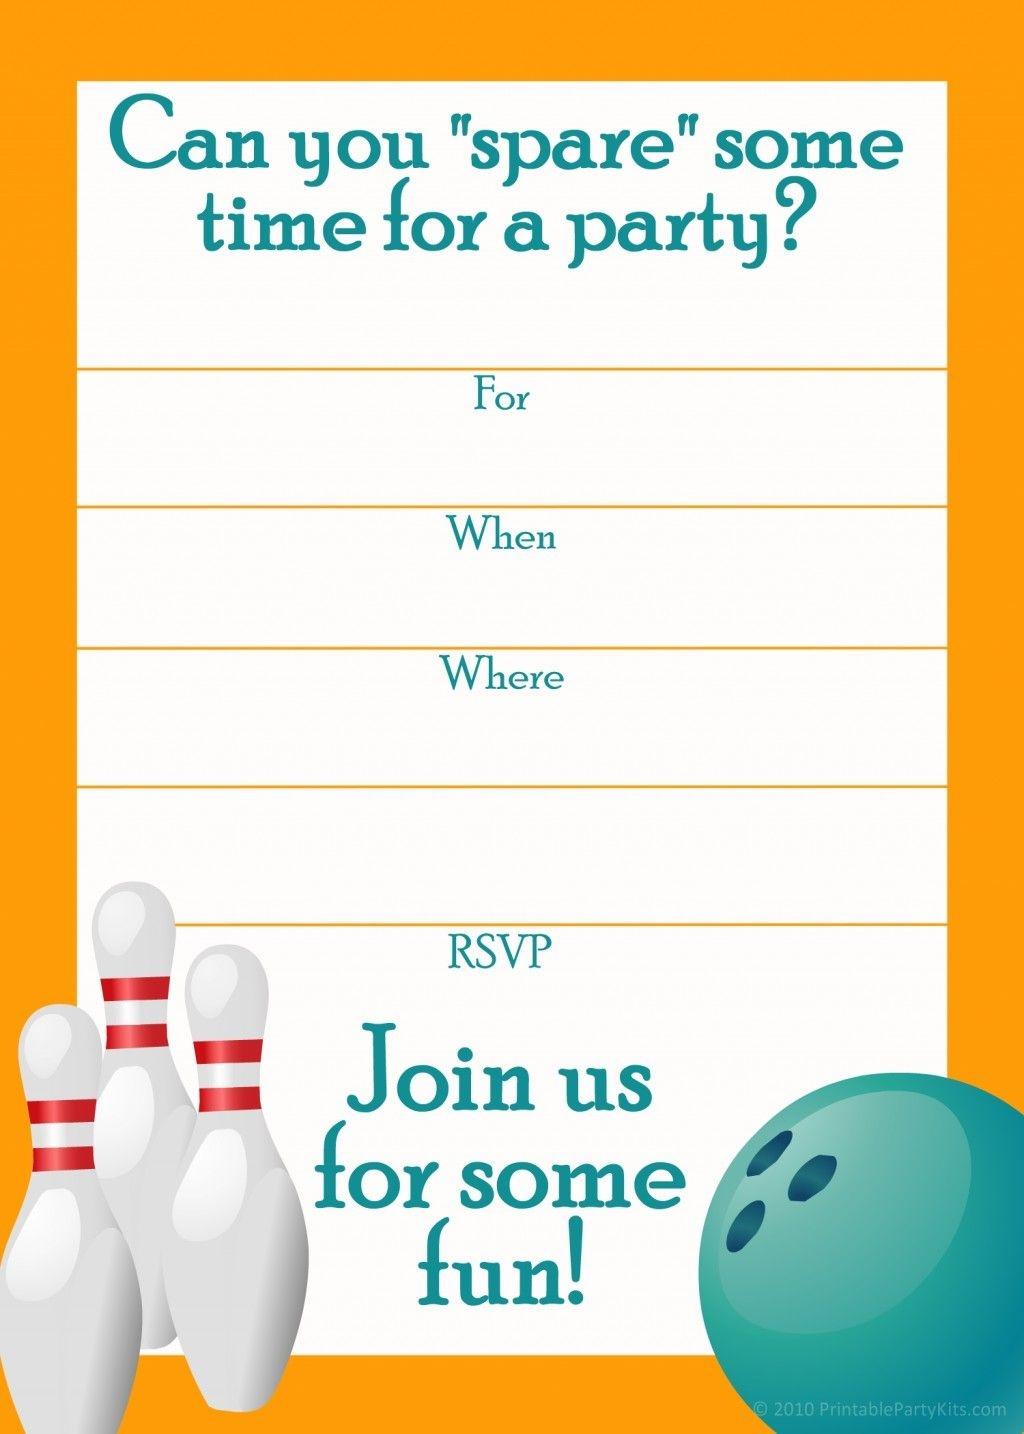 Free Printable Sports Birthday Party Invitations Templates | Dakota - Free Printable Bowling Birthday Party Invitations